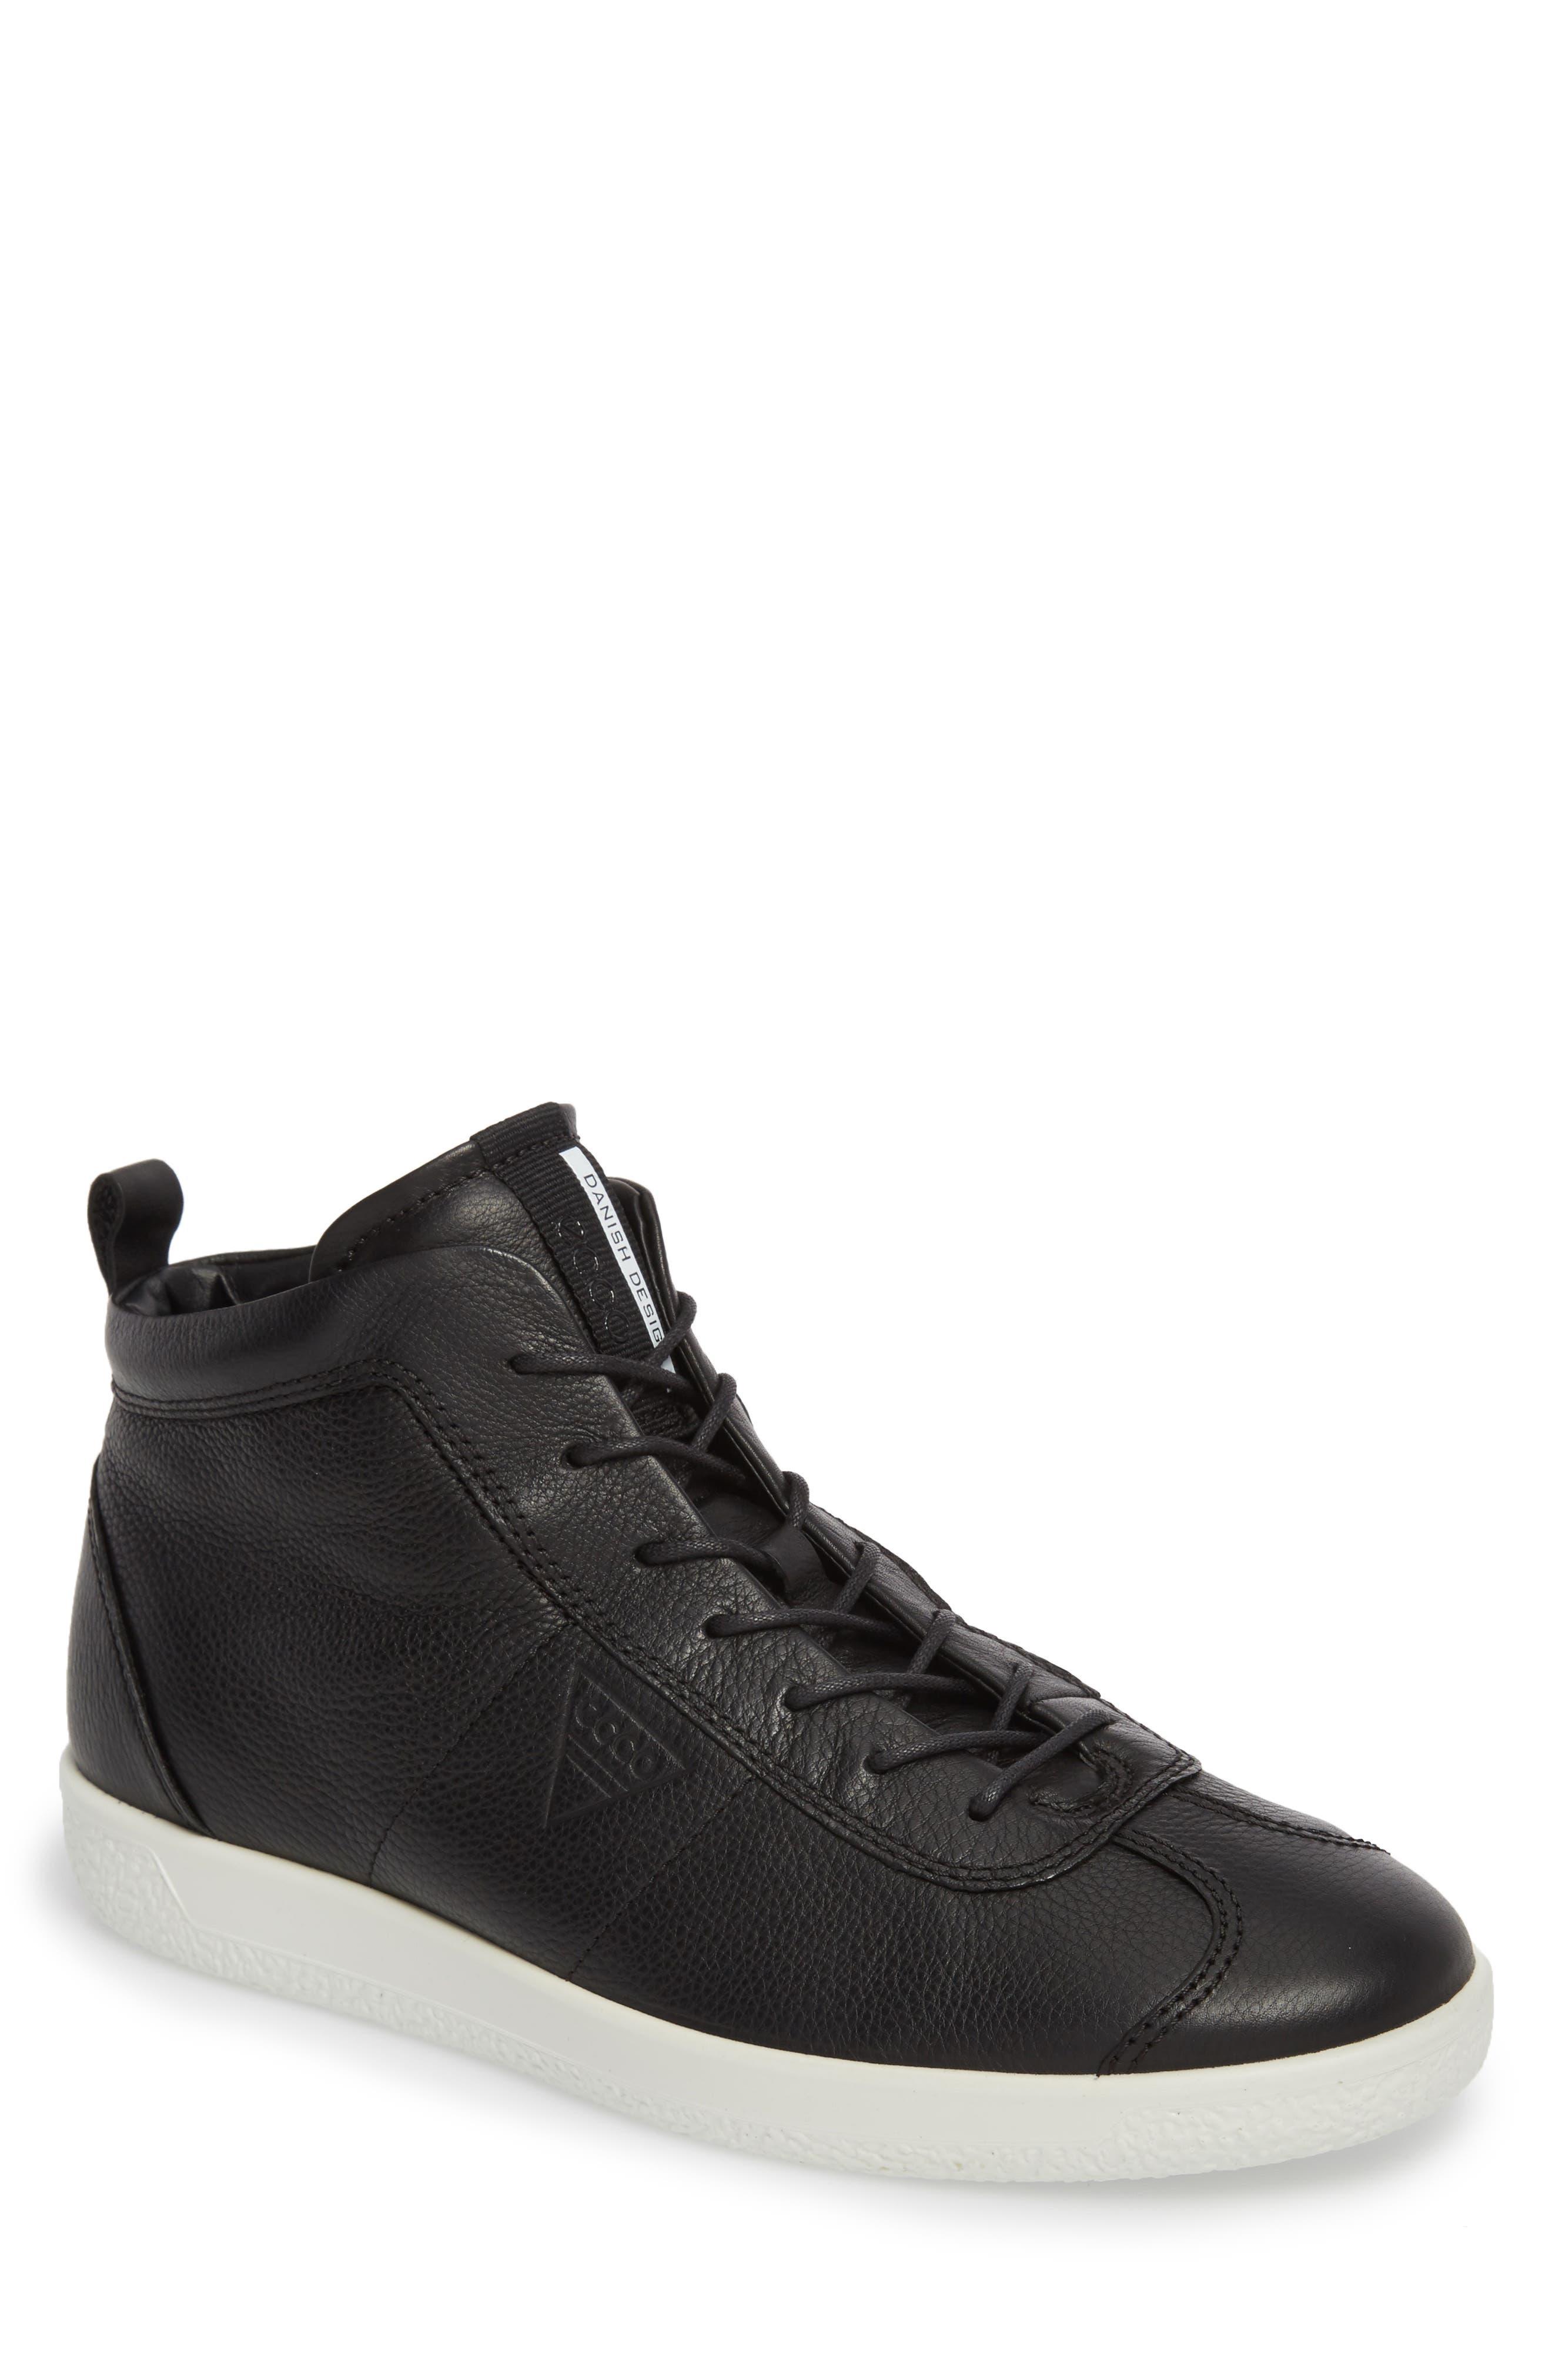 Soft 1 High Top Sneaker,                             Main thumbnail 1, color,                             009